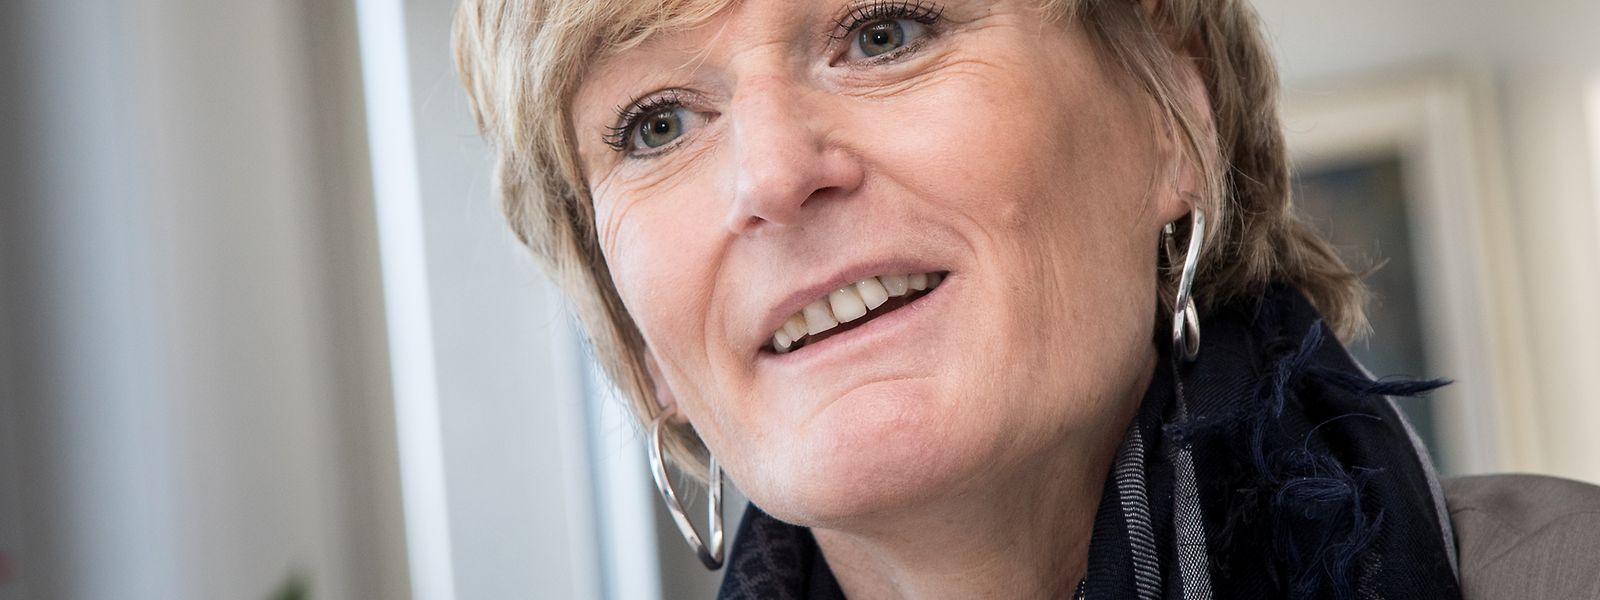 Francine Closener  soll für Marc Angel ins Parlament nachrücken, wenn Angel ins EU-Parlament wechselt.